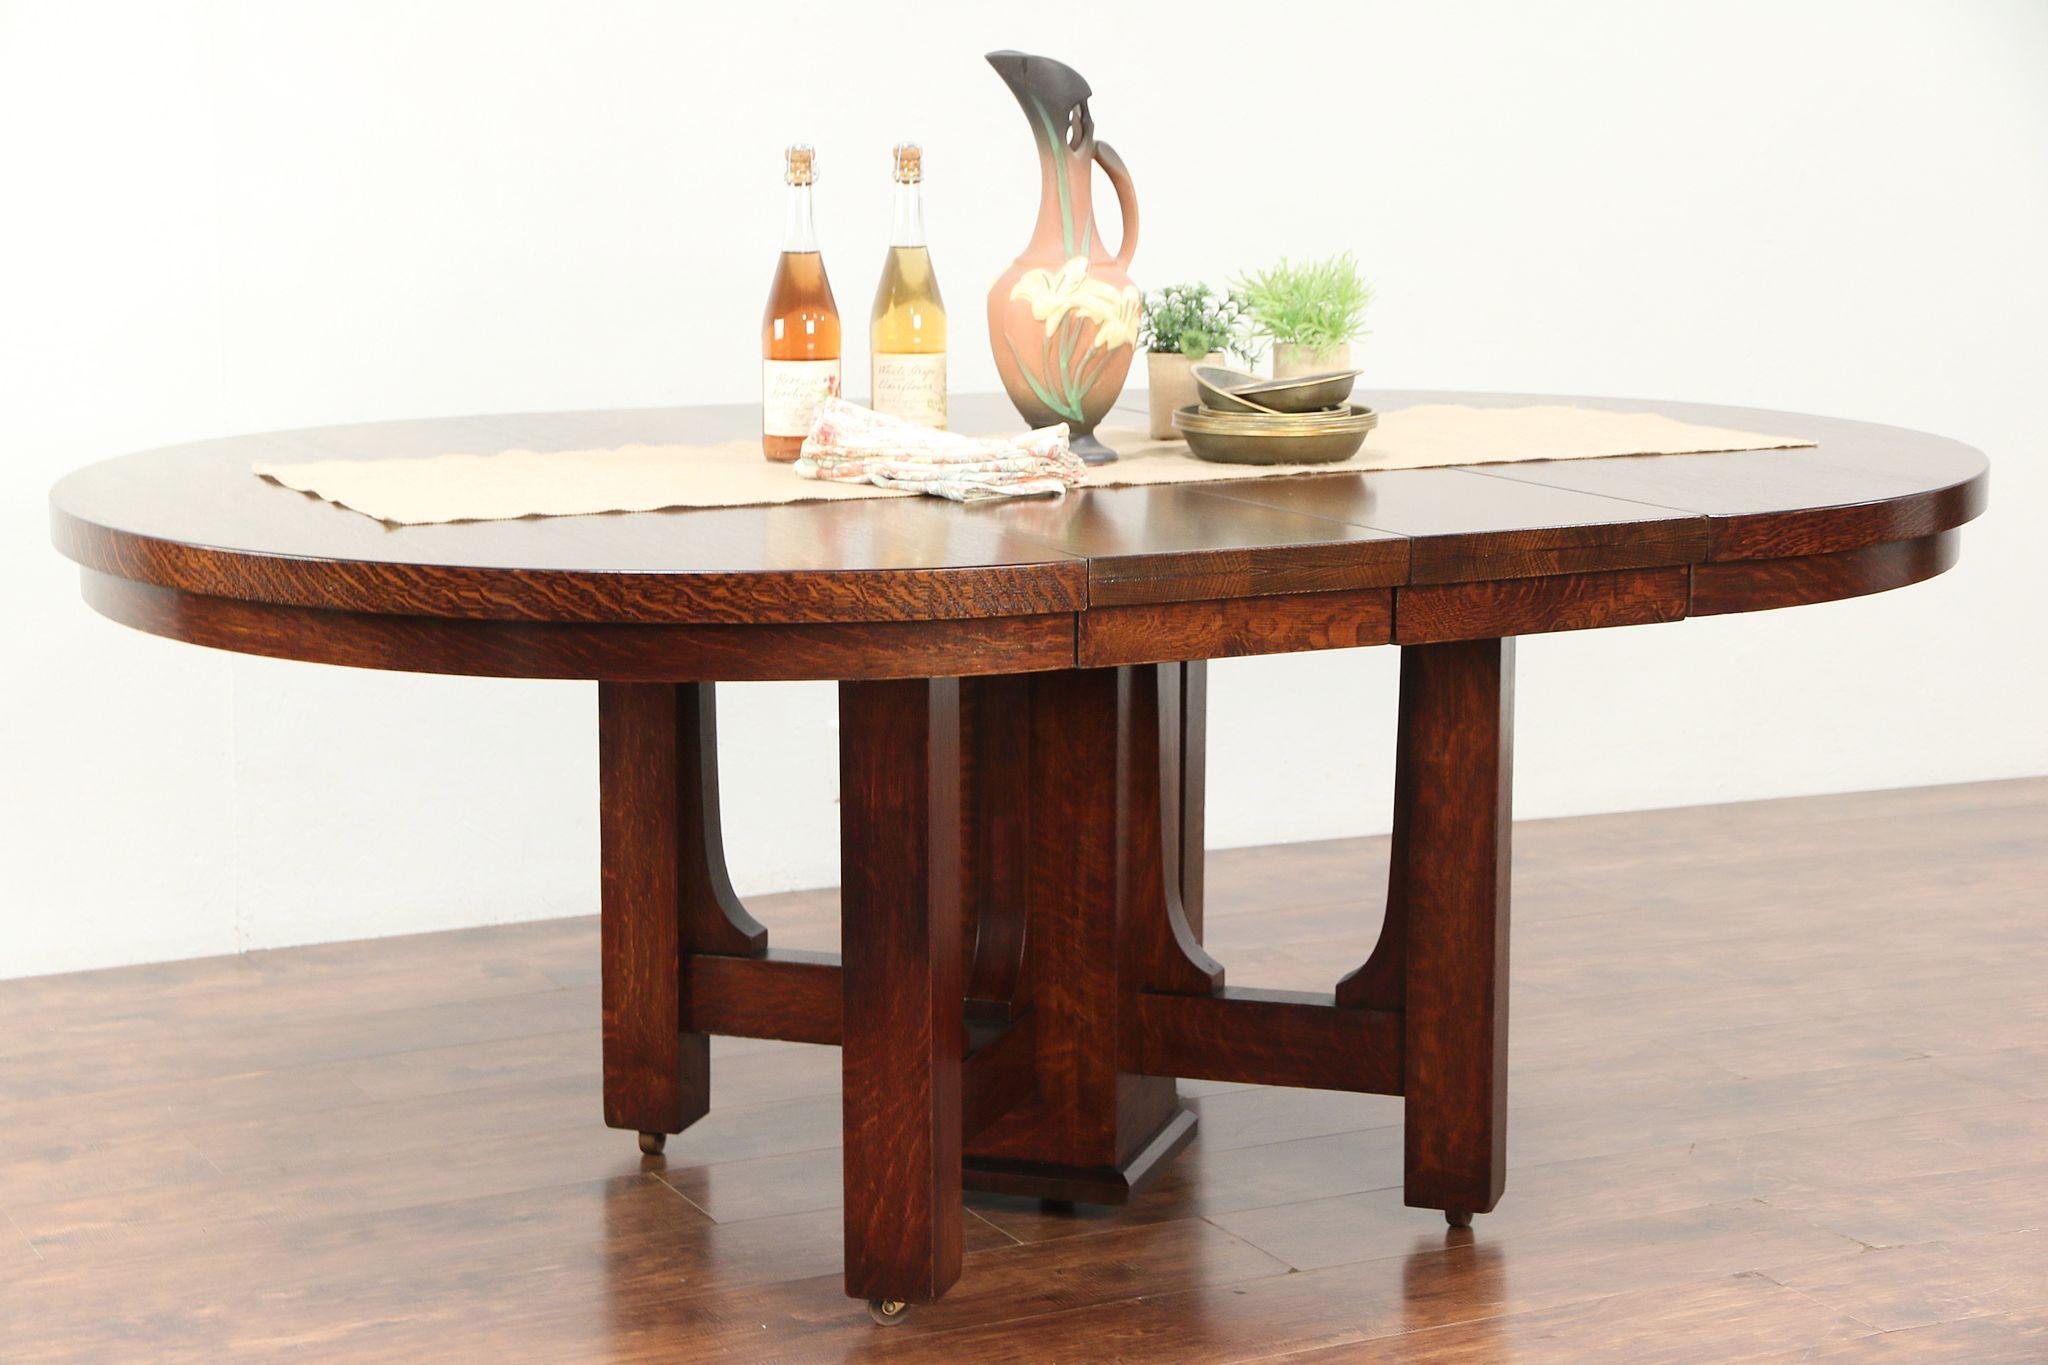 Sold Arts Crafts Mission Oak Antique Craftsman 54 Dining Table 2 Leaves 29446 Harp Gallery Antiques Furniture